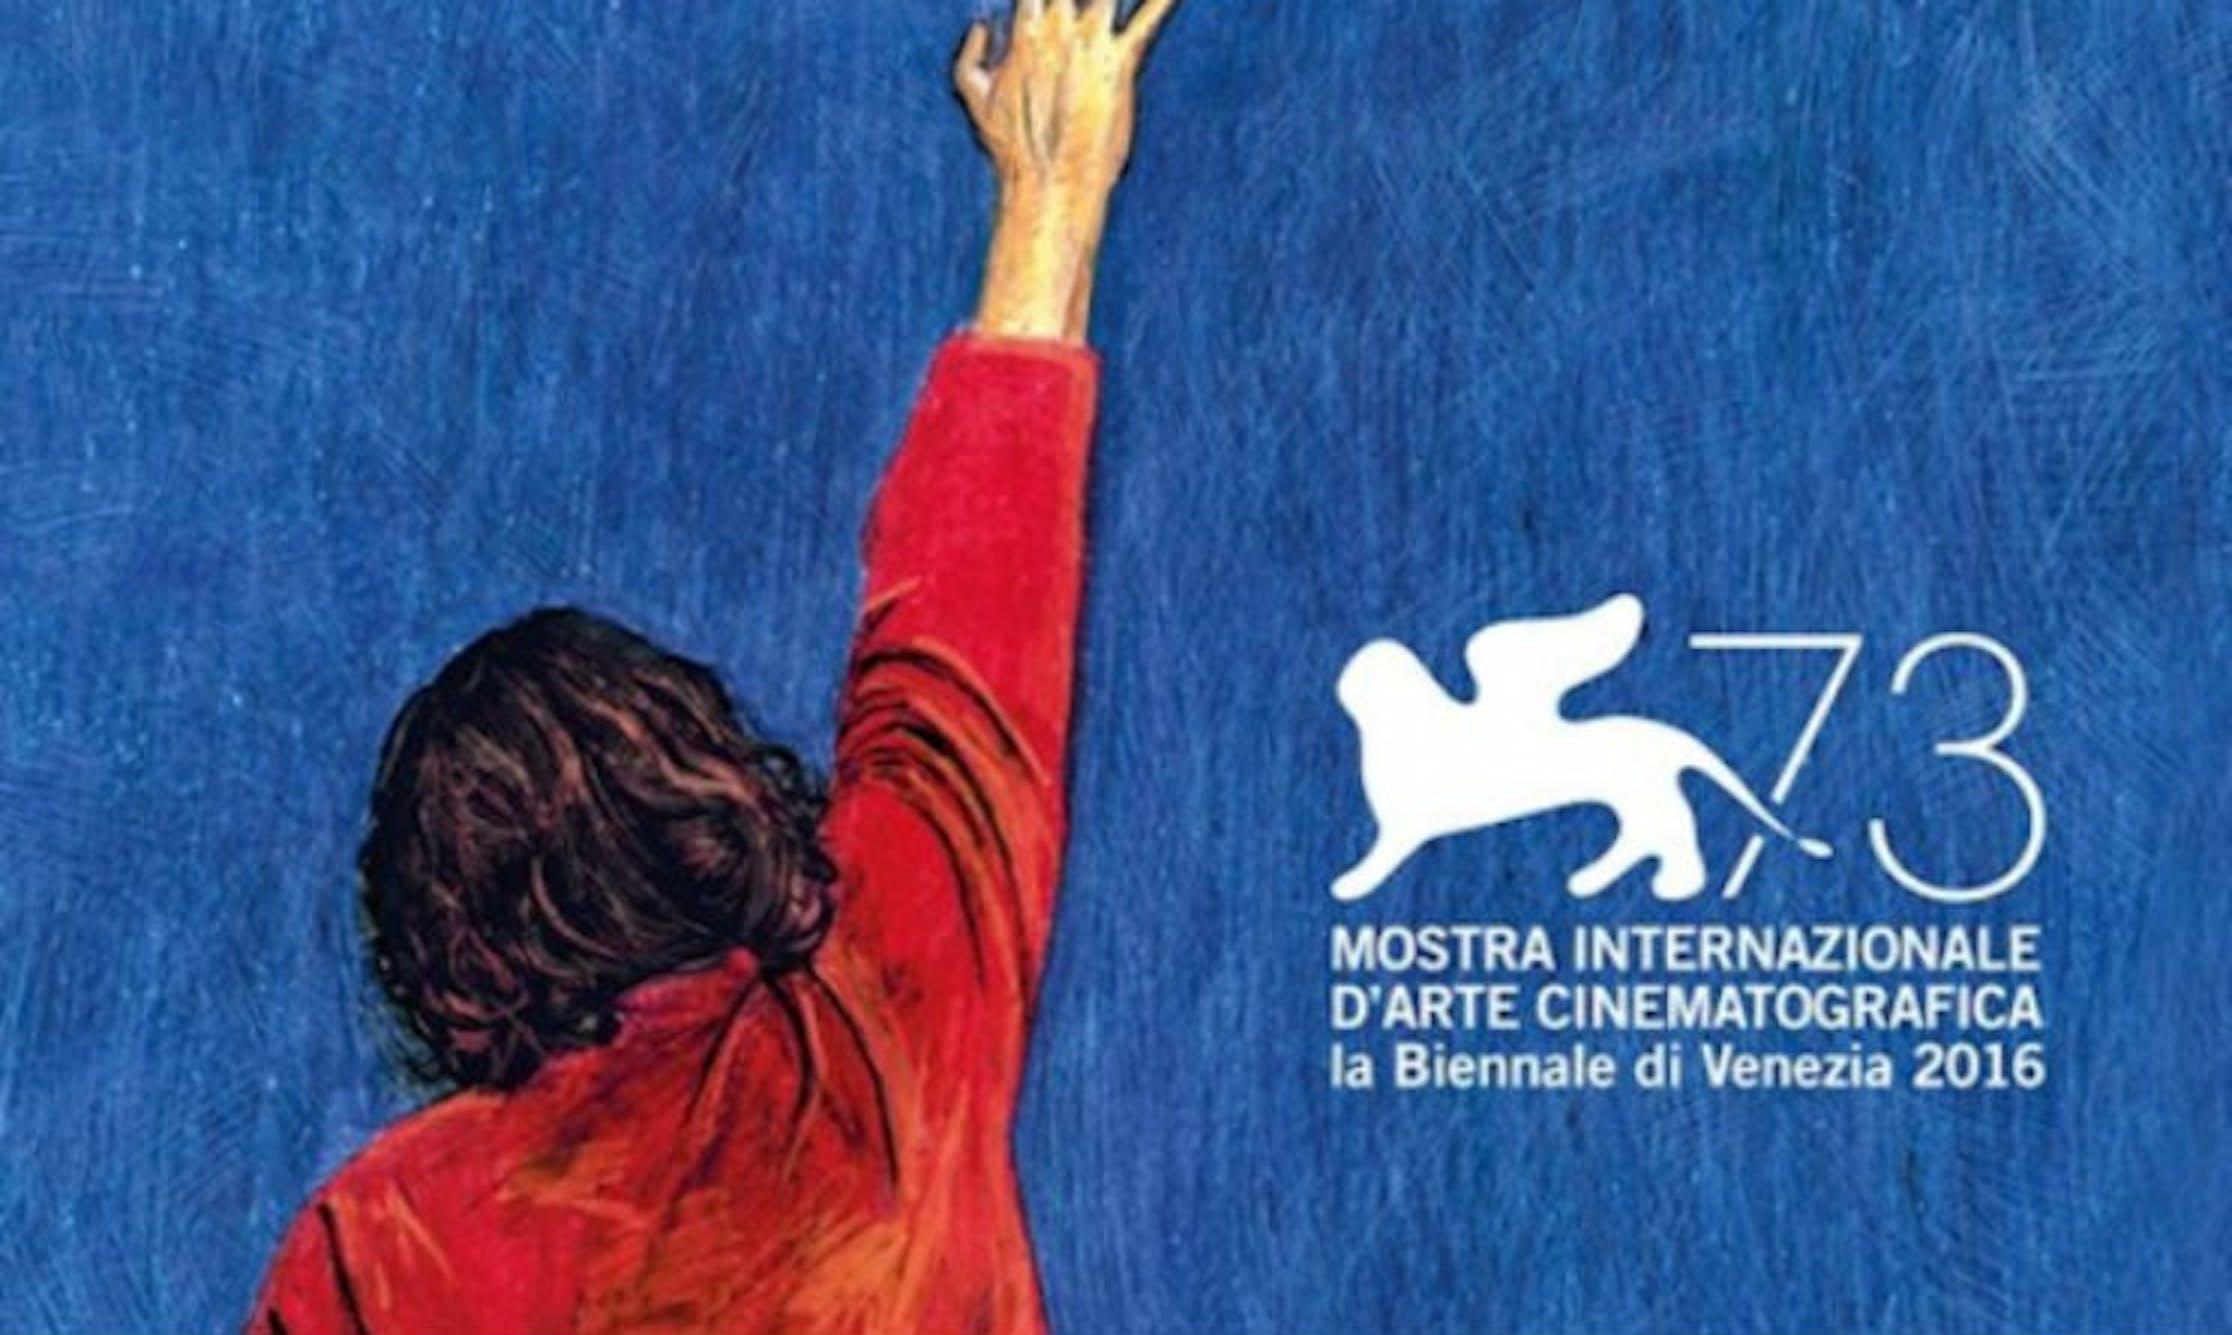 Mostra-del-Cinema-di-Venezia-2016.jpg